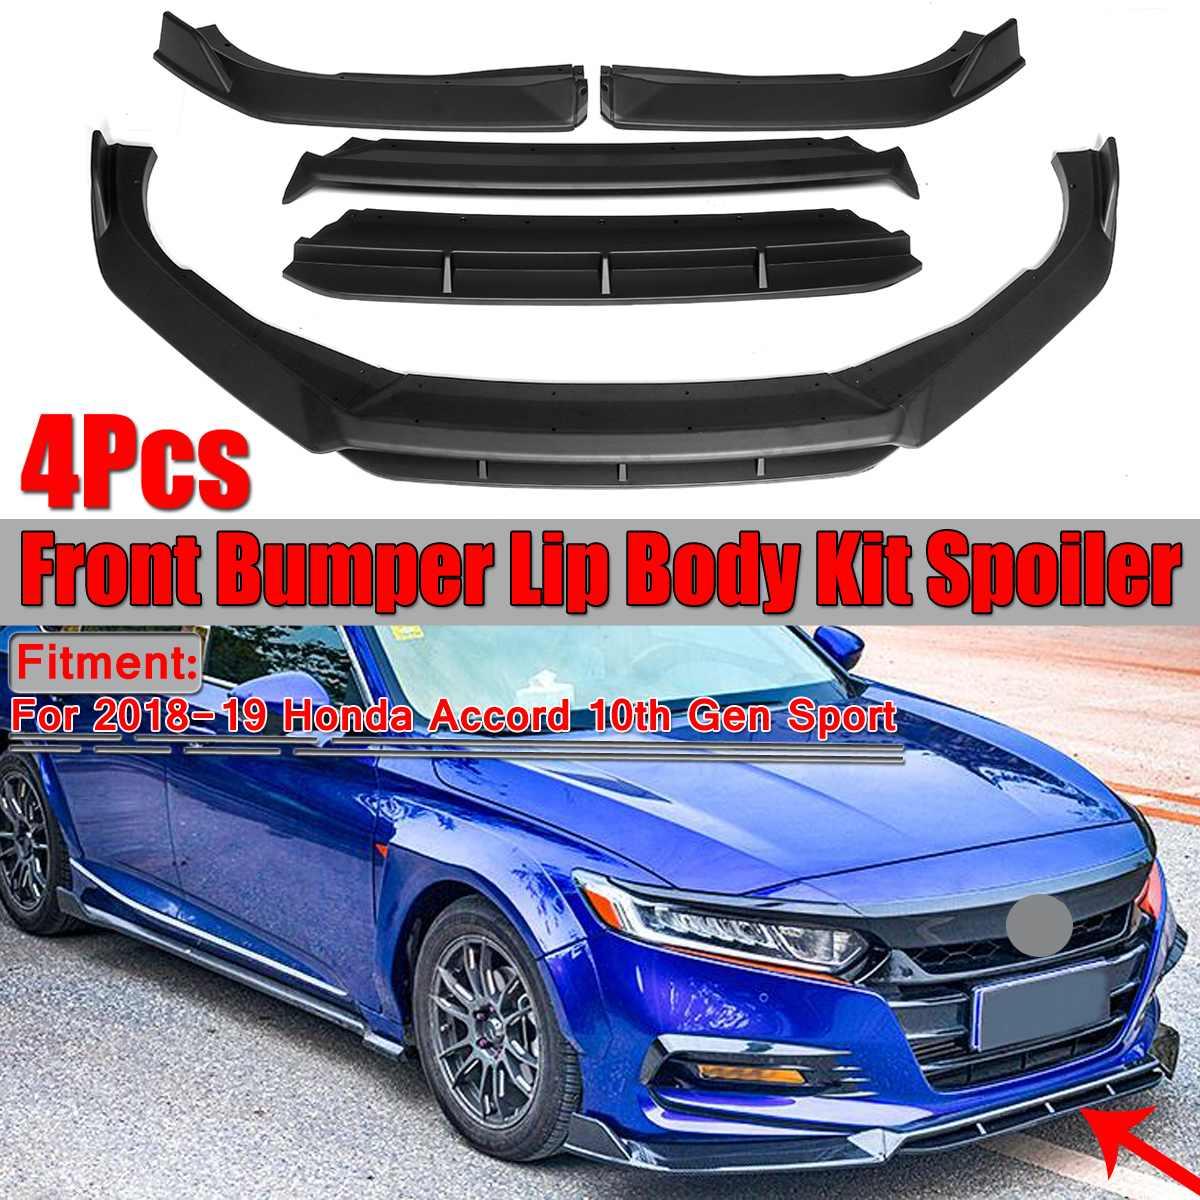 4 Stuk Auto Voorbumper Lip Splitter Body Kit Spoiler Splitter Voorbumper Lip Voor Honda Accord 10th 2018 2019 Gen Sport